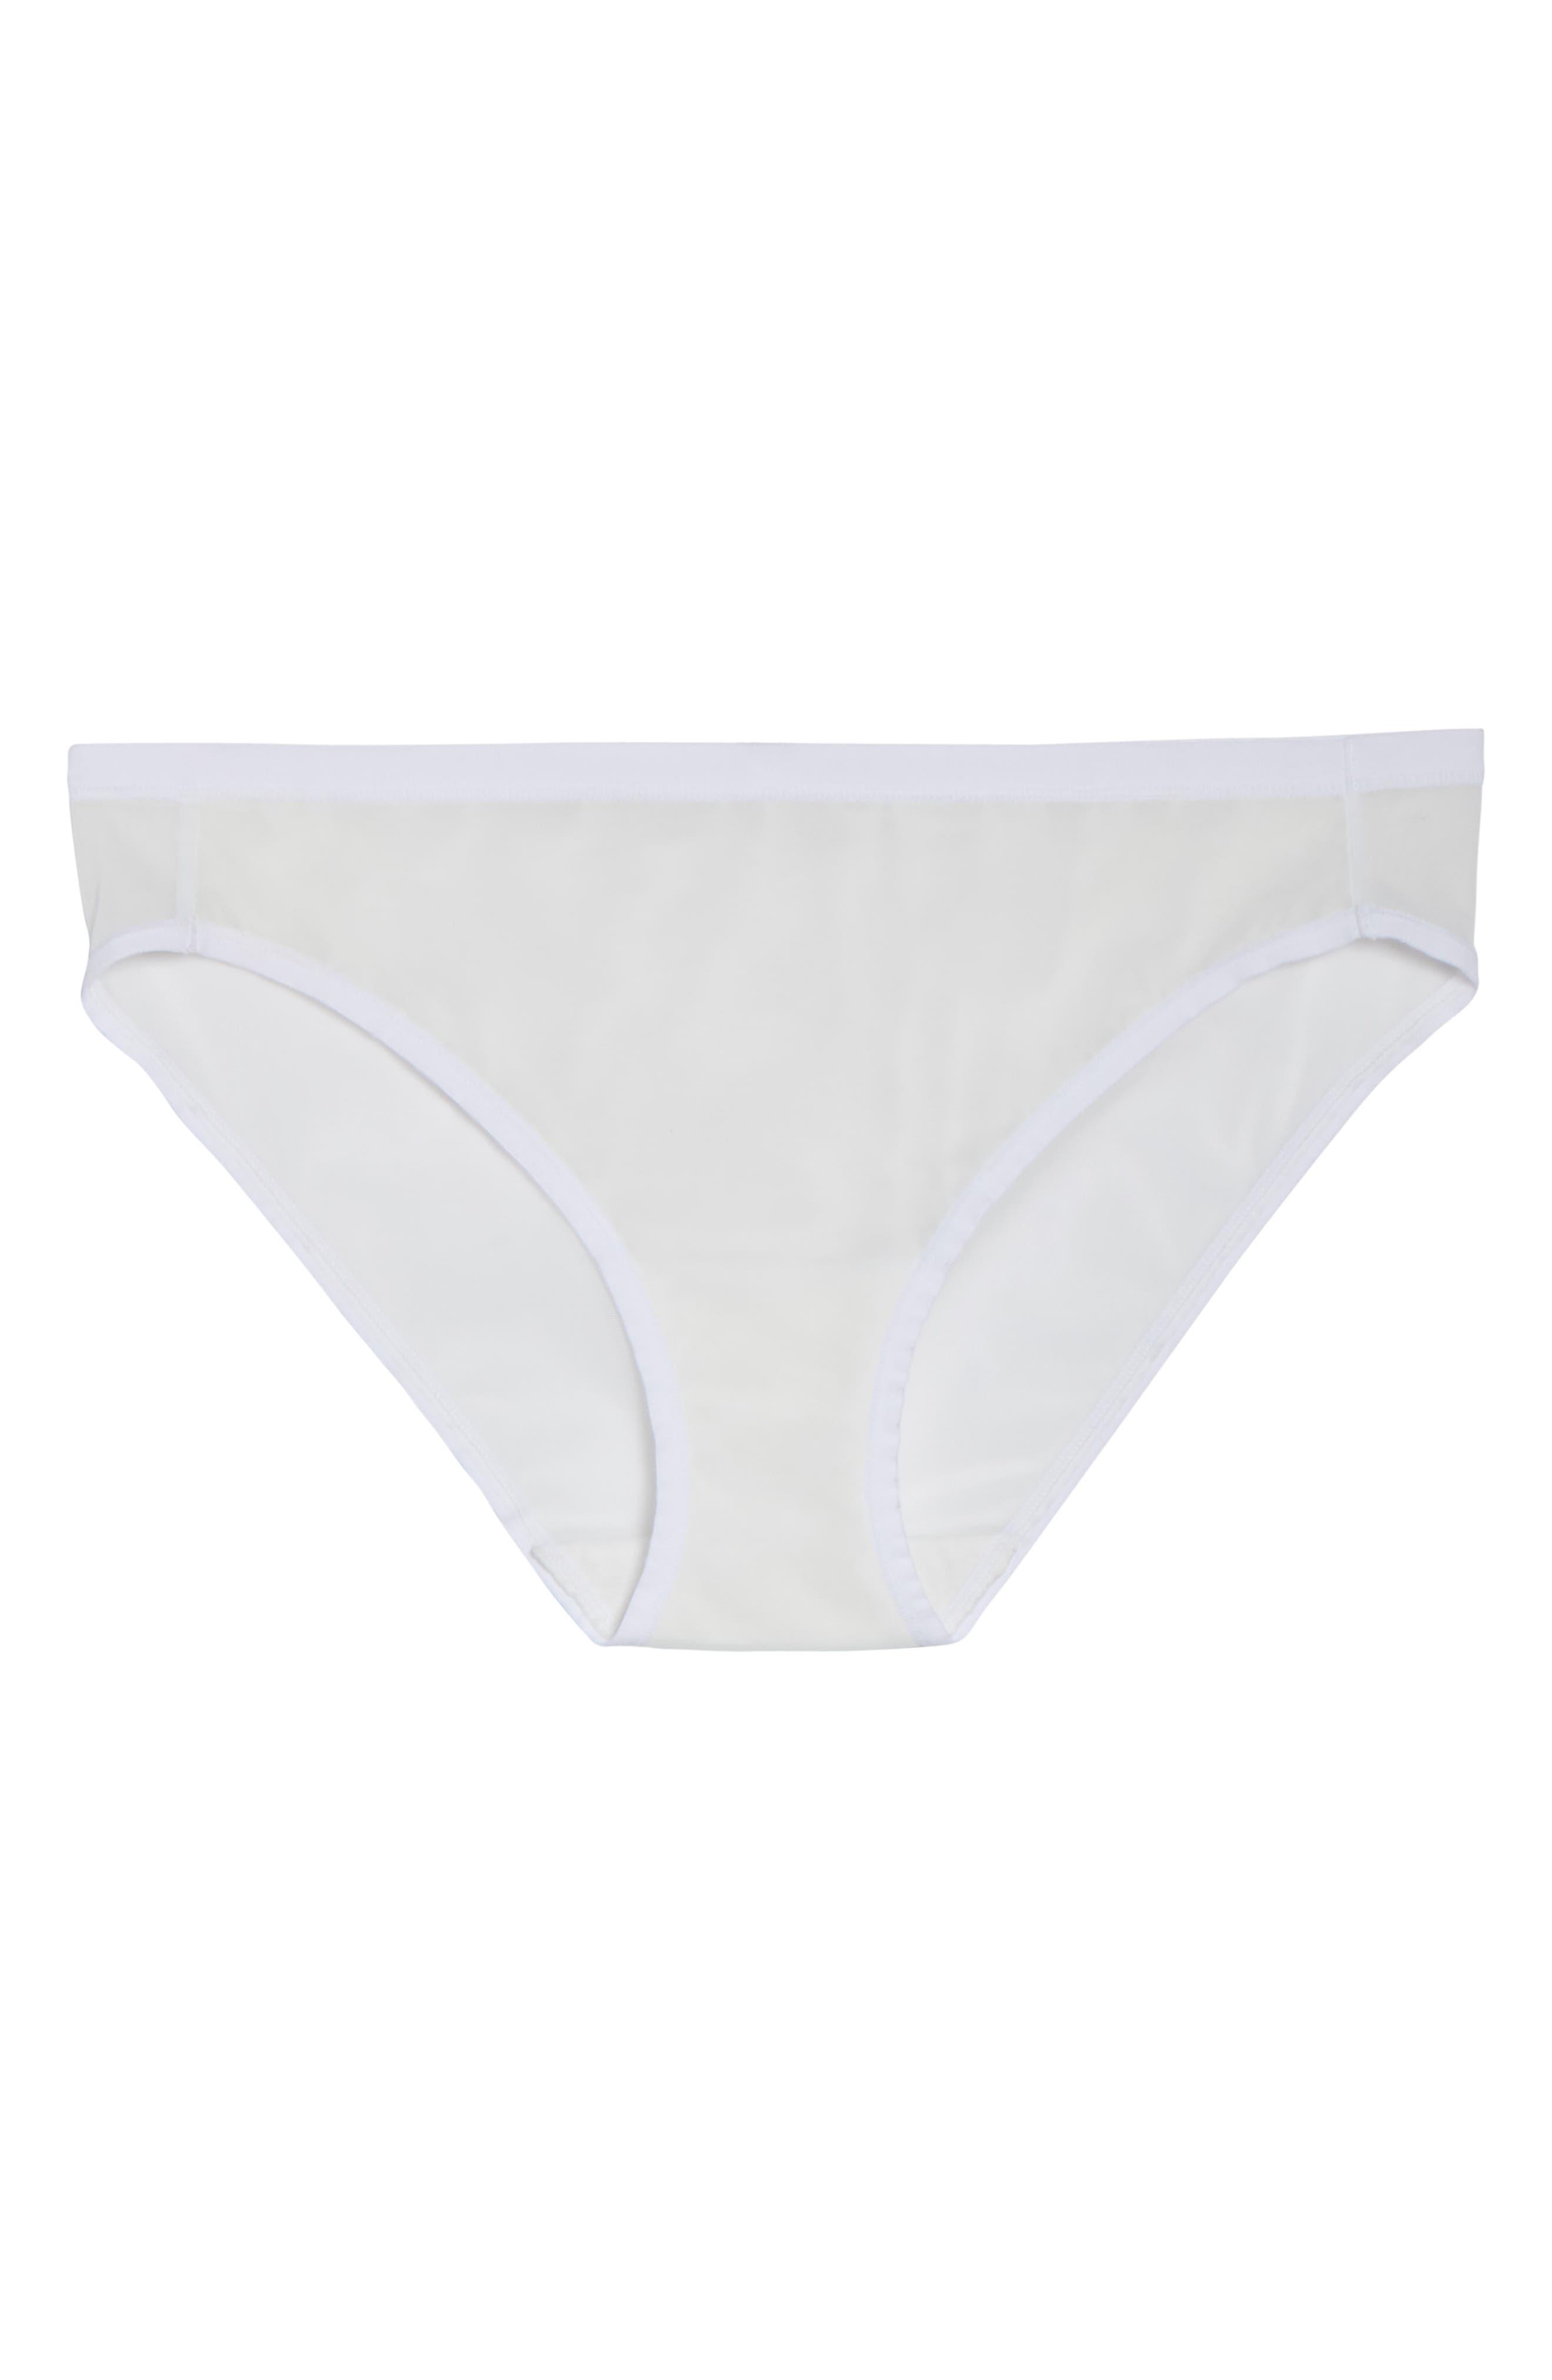 Bliss Light Bikini,                             Alternate thumbnail 4, color,                             White